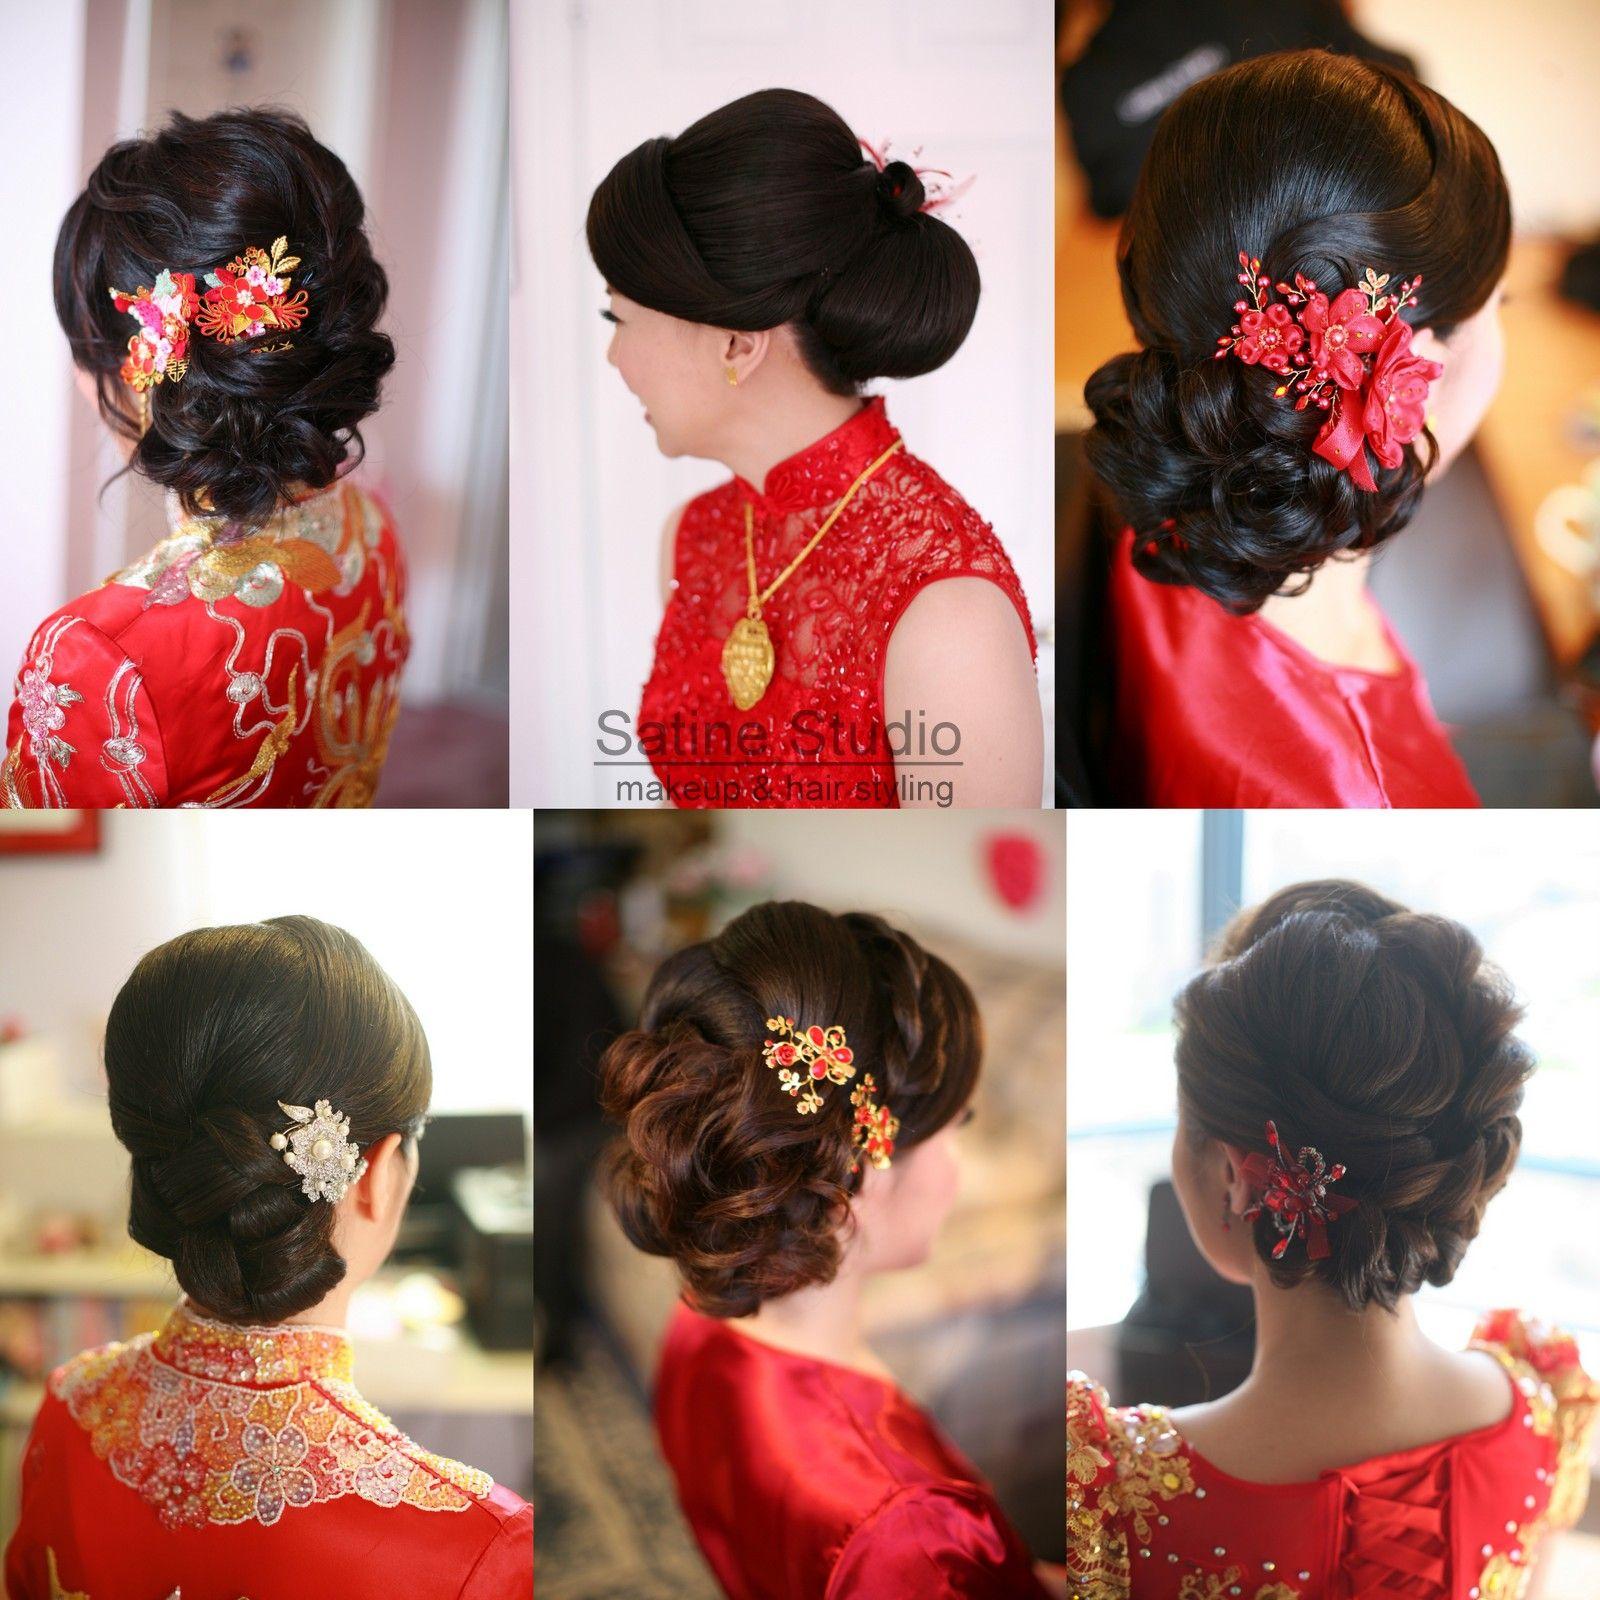 Wedding Hairstyles Asian Hair: Chinese Wedding Hairstyles Satinestudio.com Bridal Updo